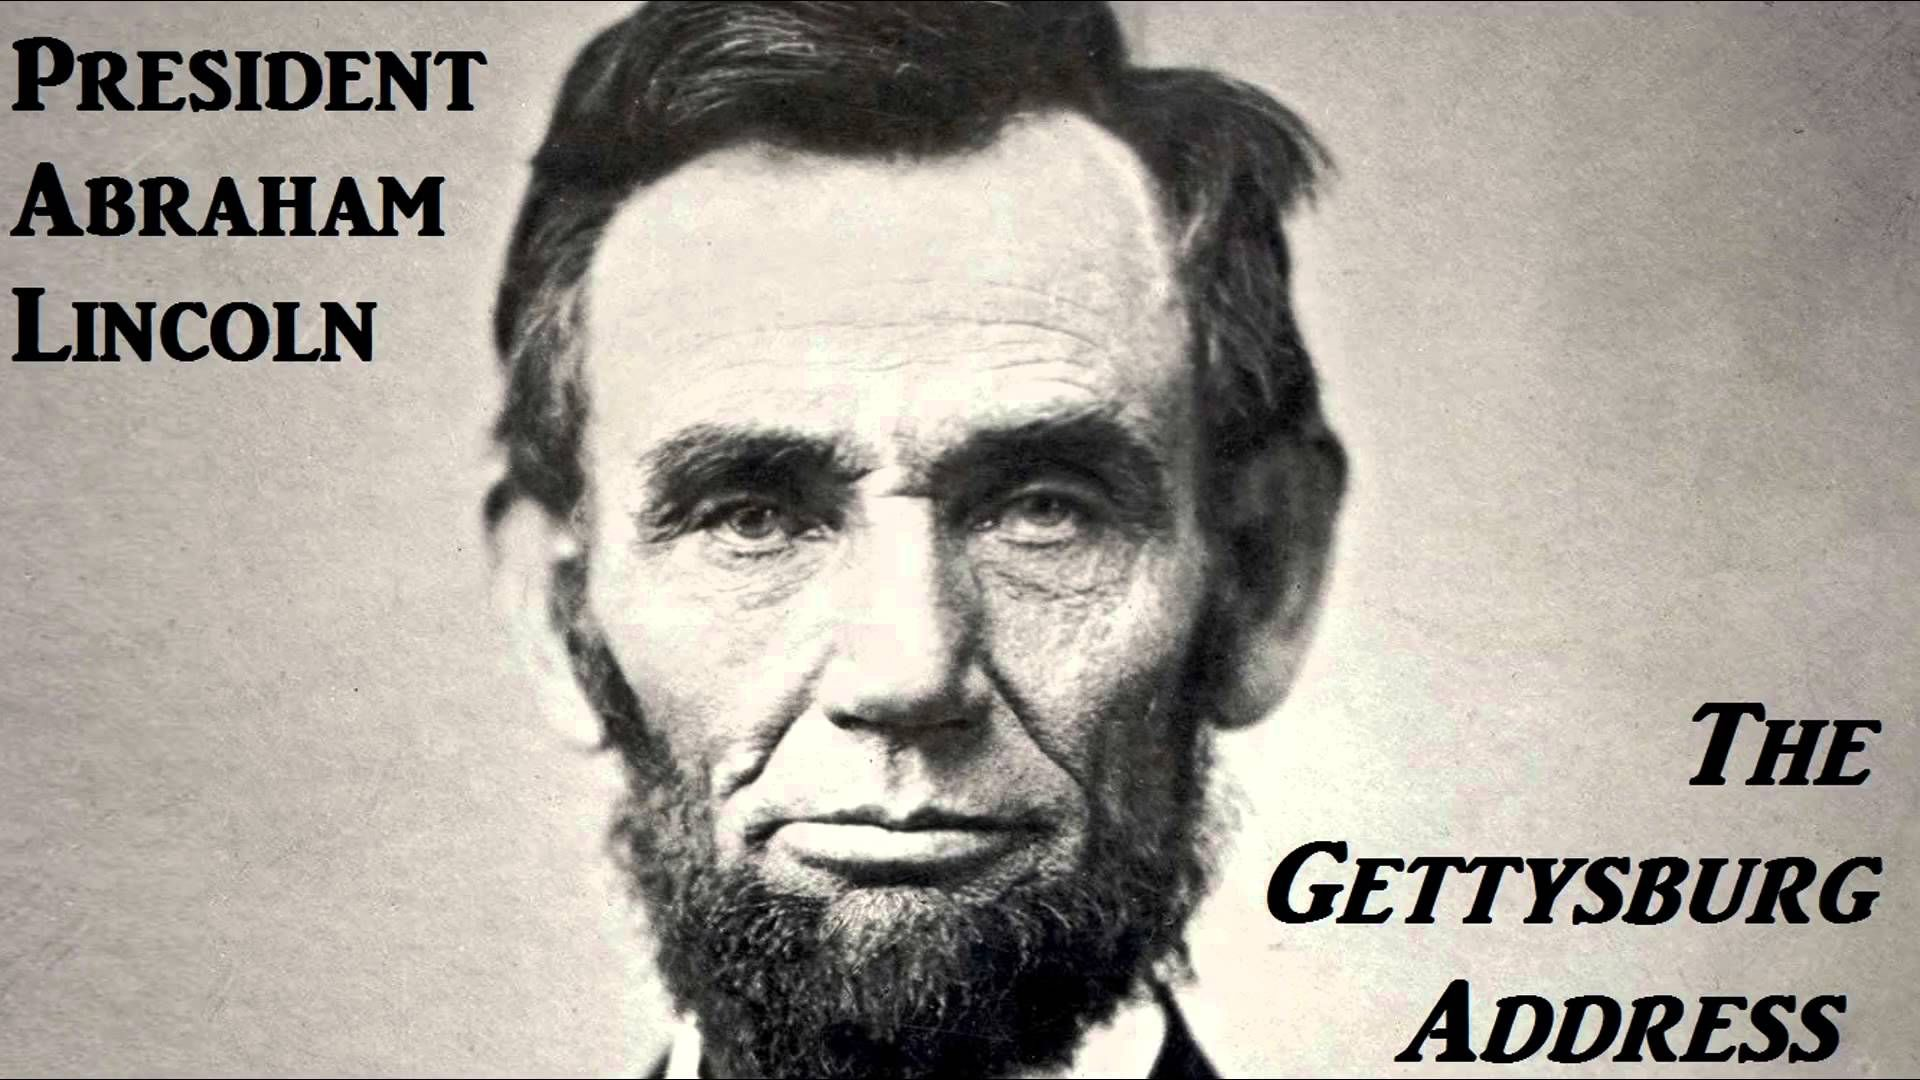 The Gettysburg Address By President Abraham Lincoln